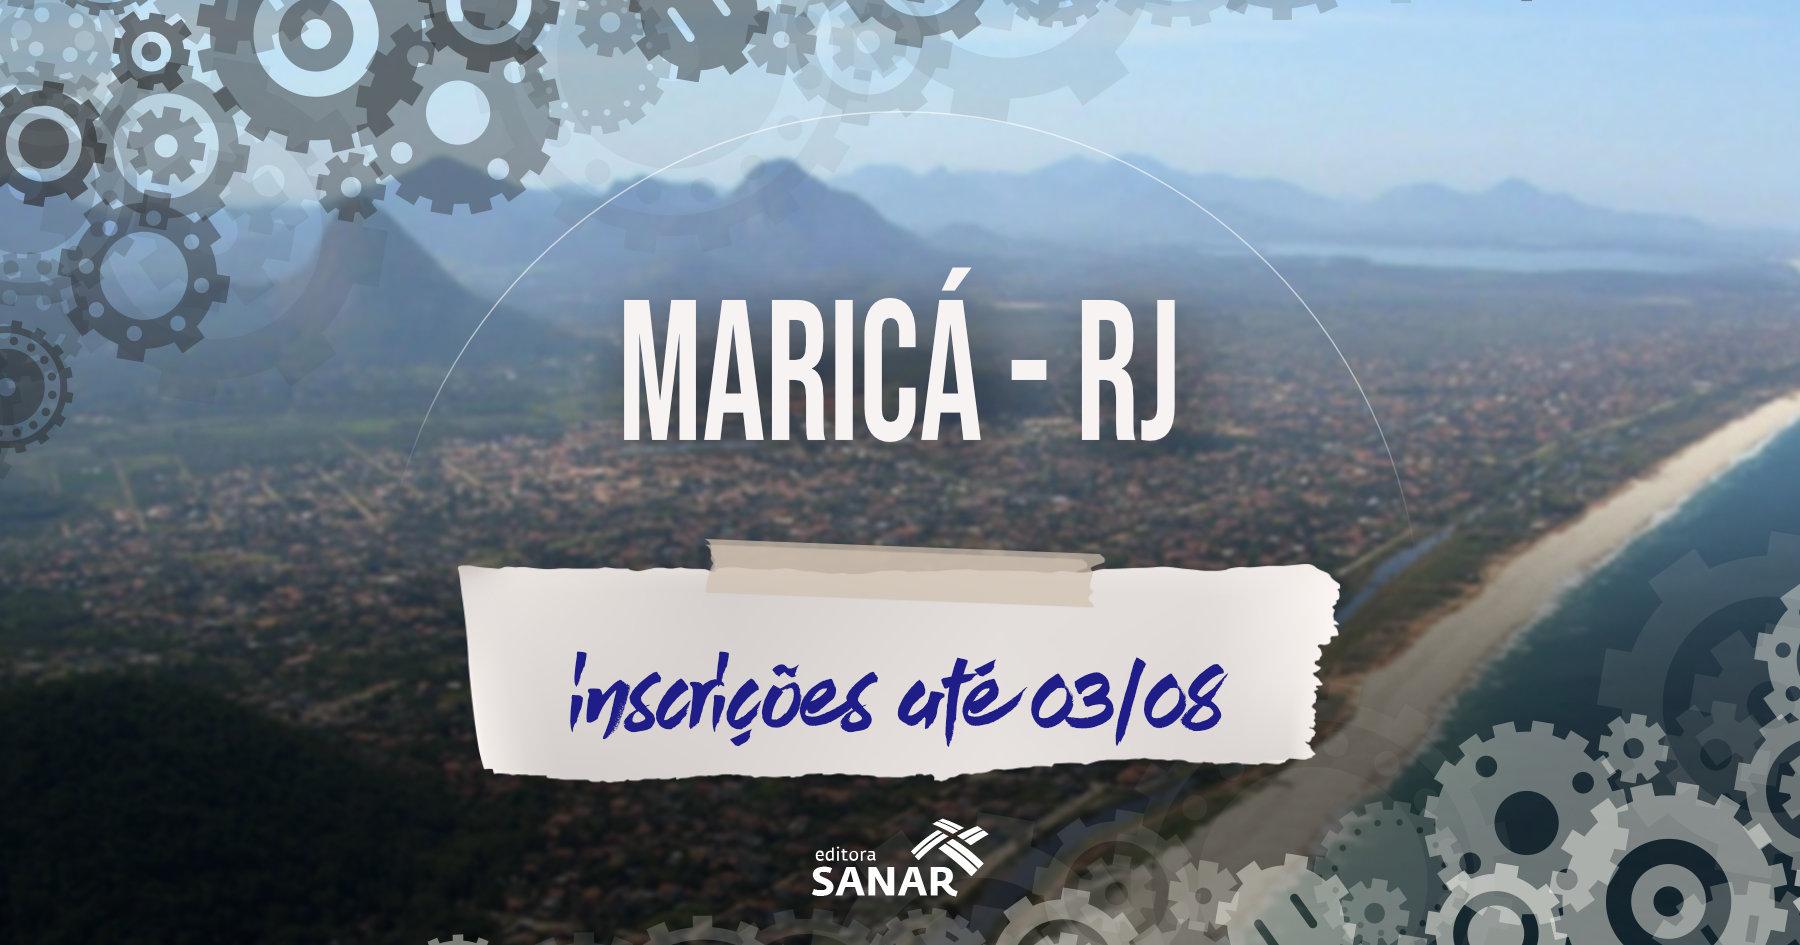 Concurso | Maricá (RJ) tem 20 vagas abertas